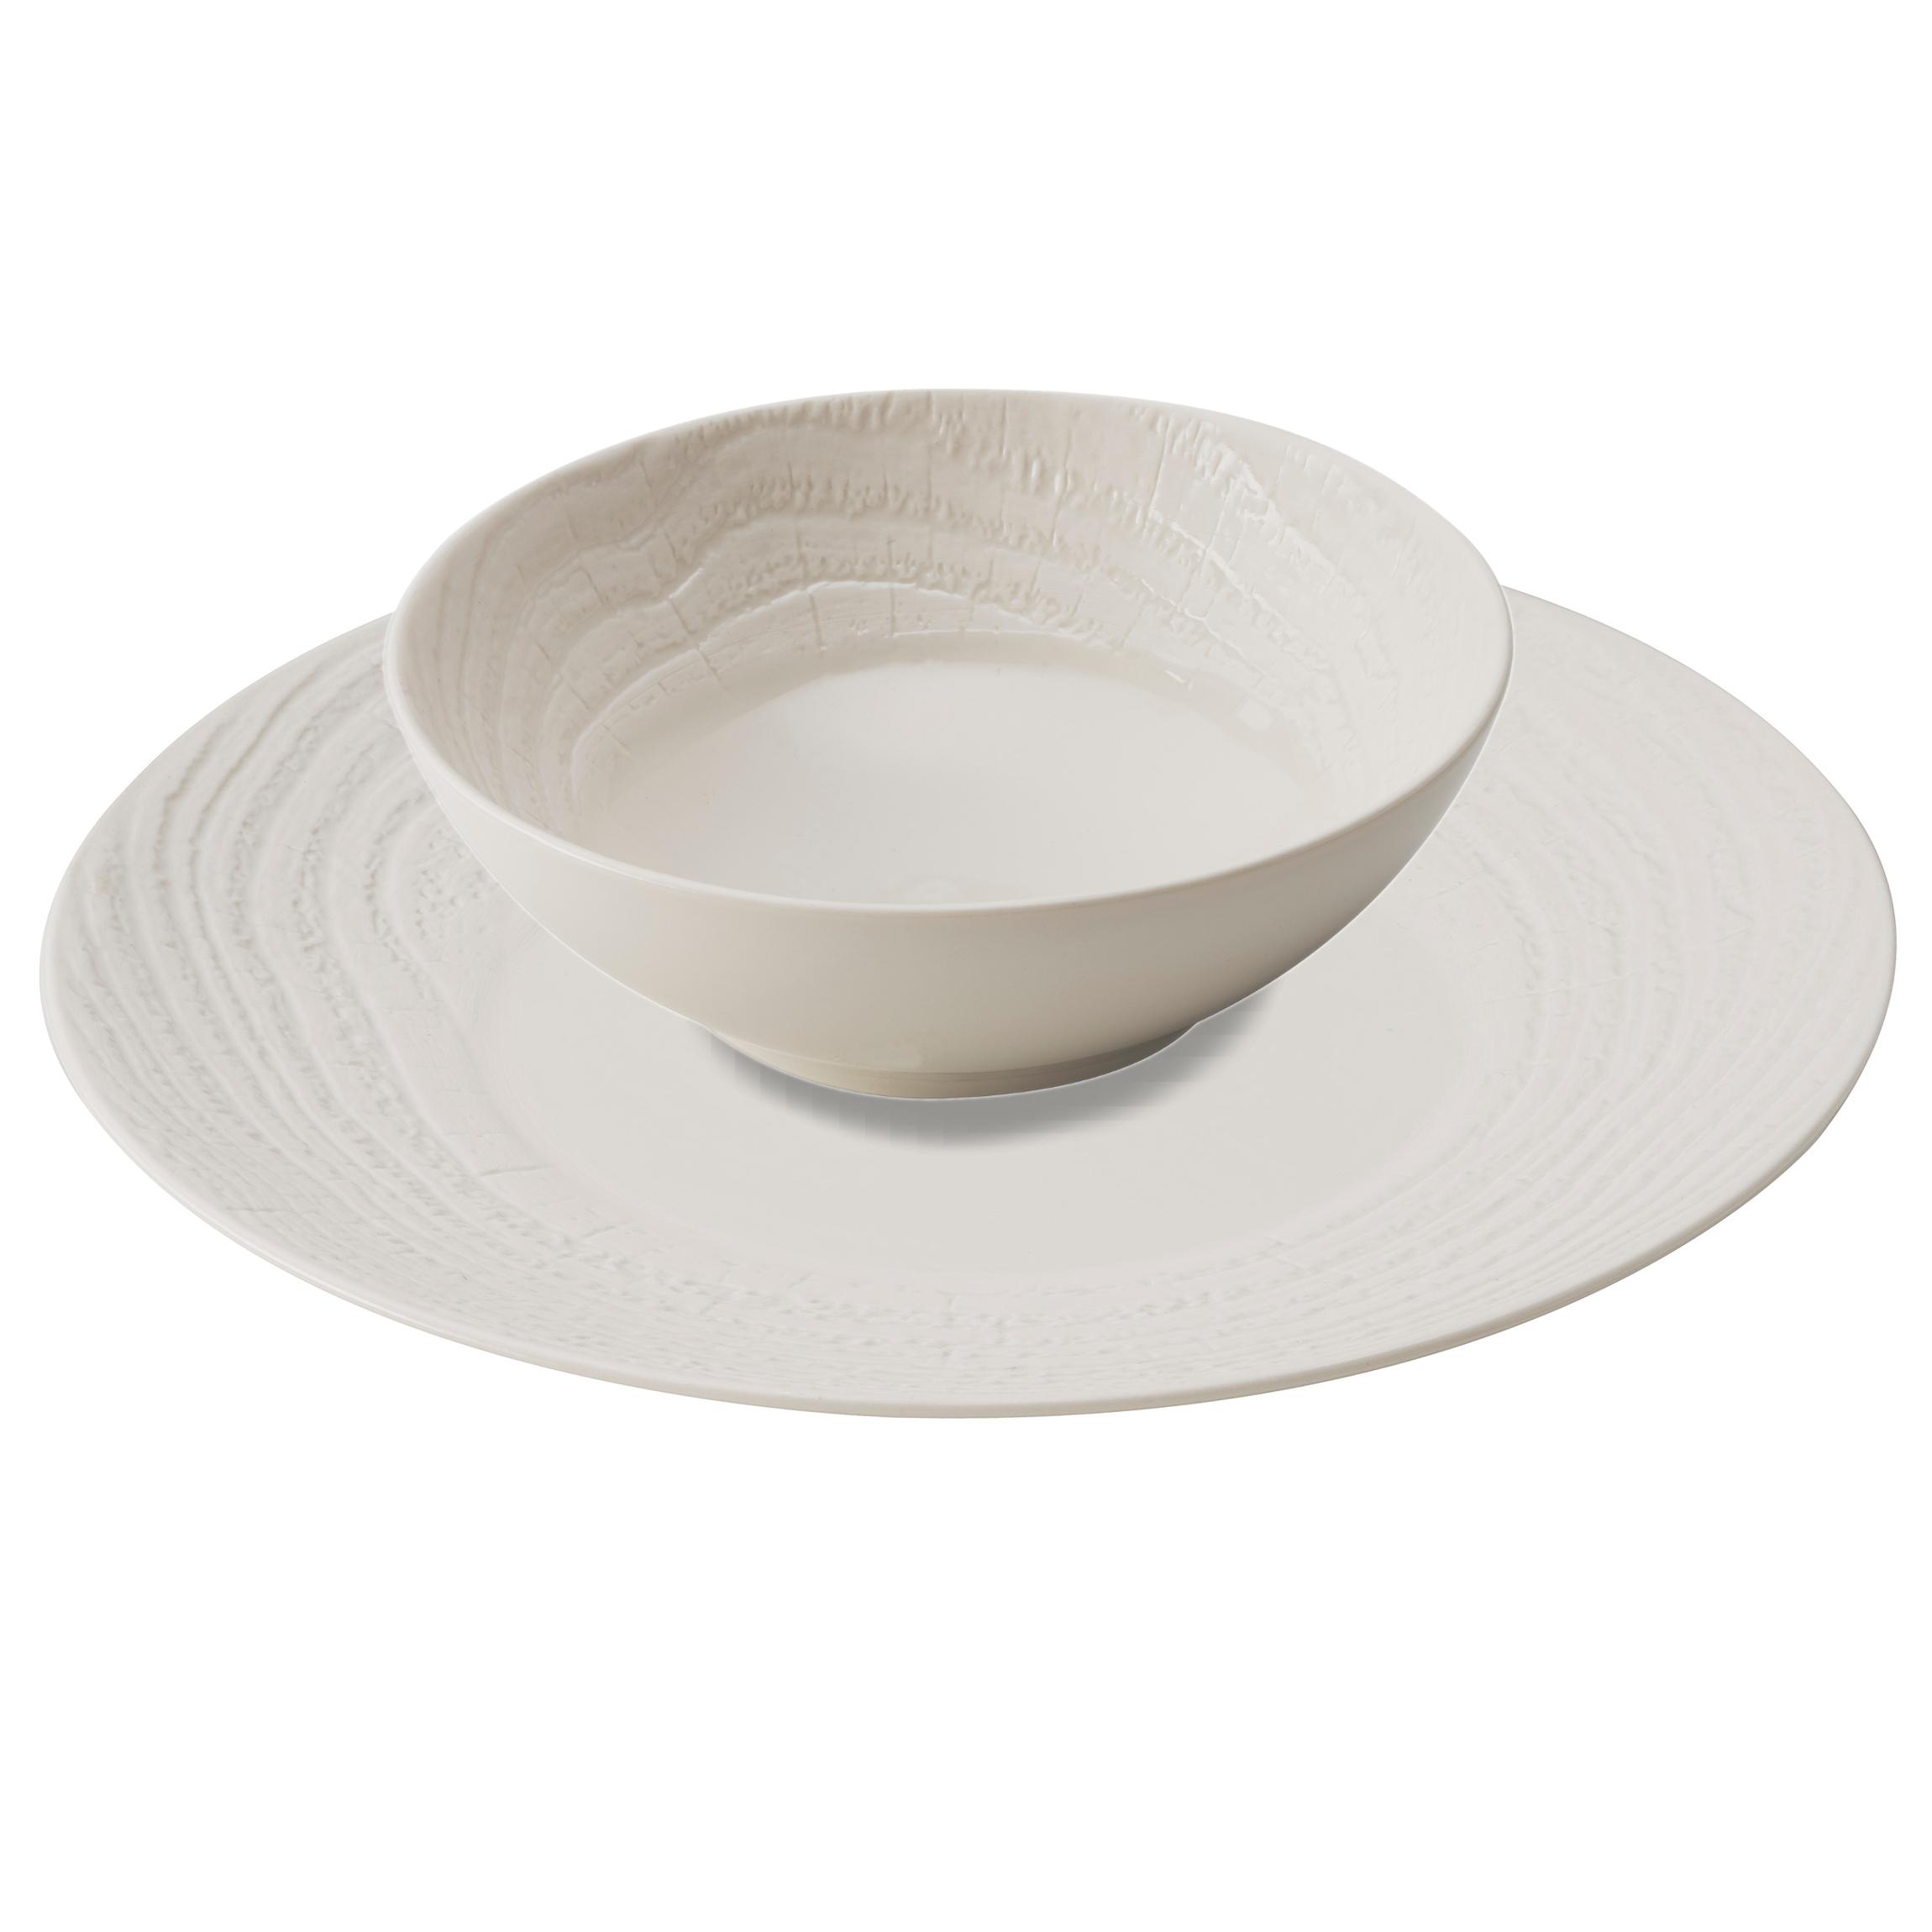 Revol Arborescence Ivory Porcelain Charger Plate and Soup Bowl Set